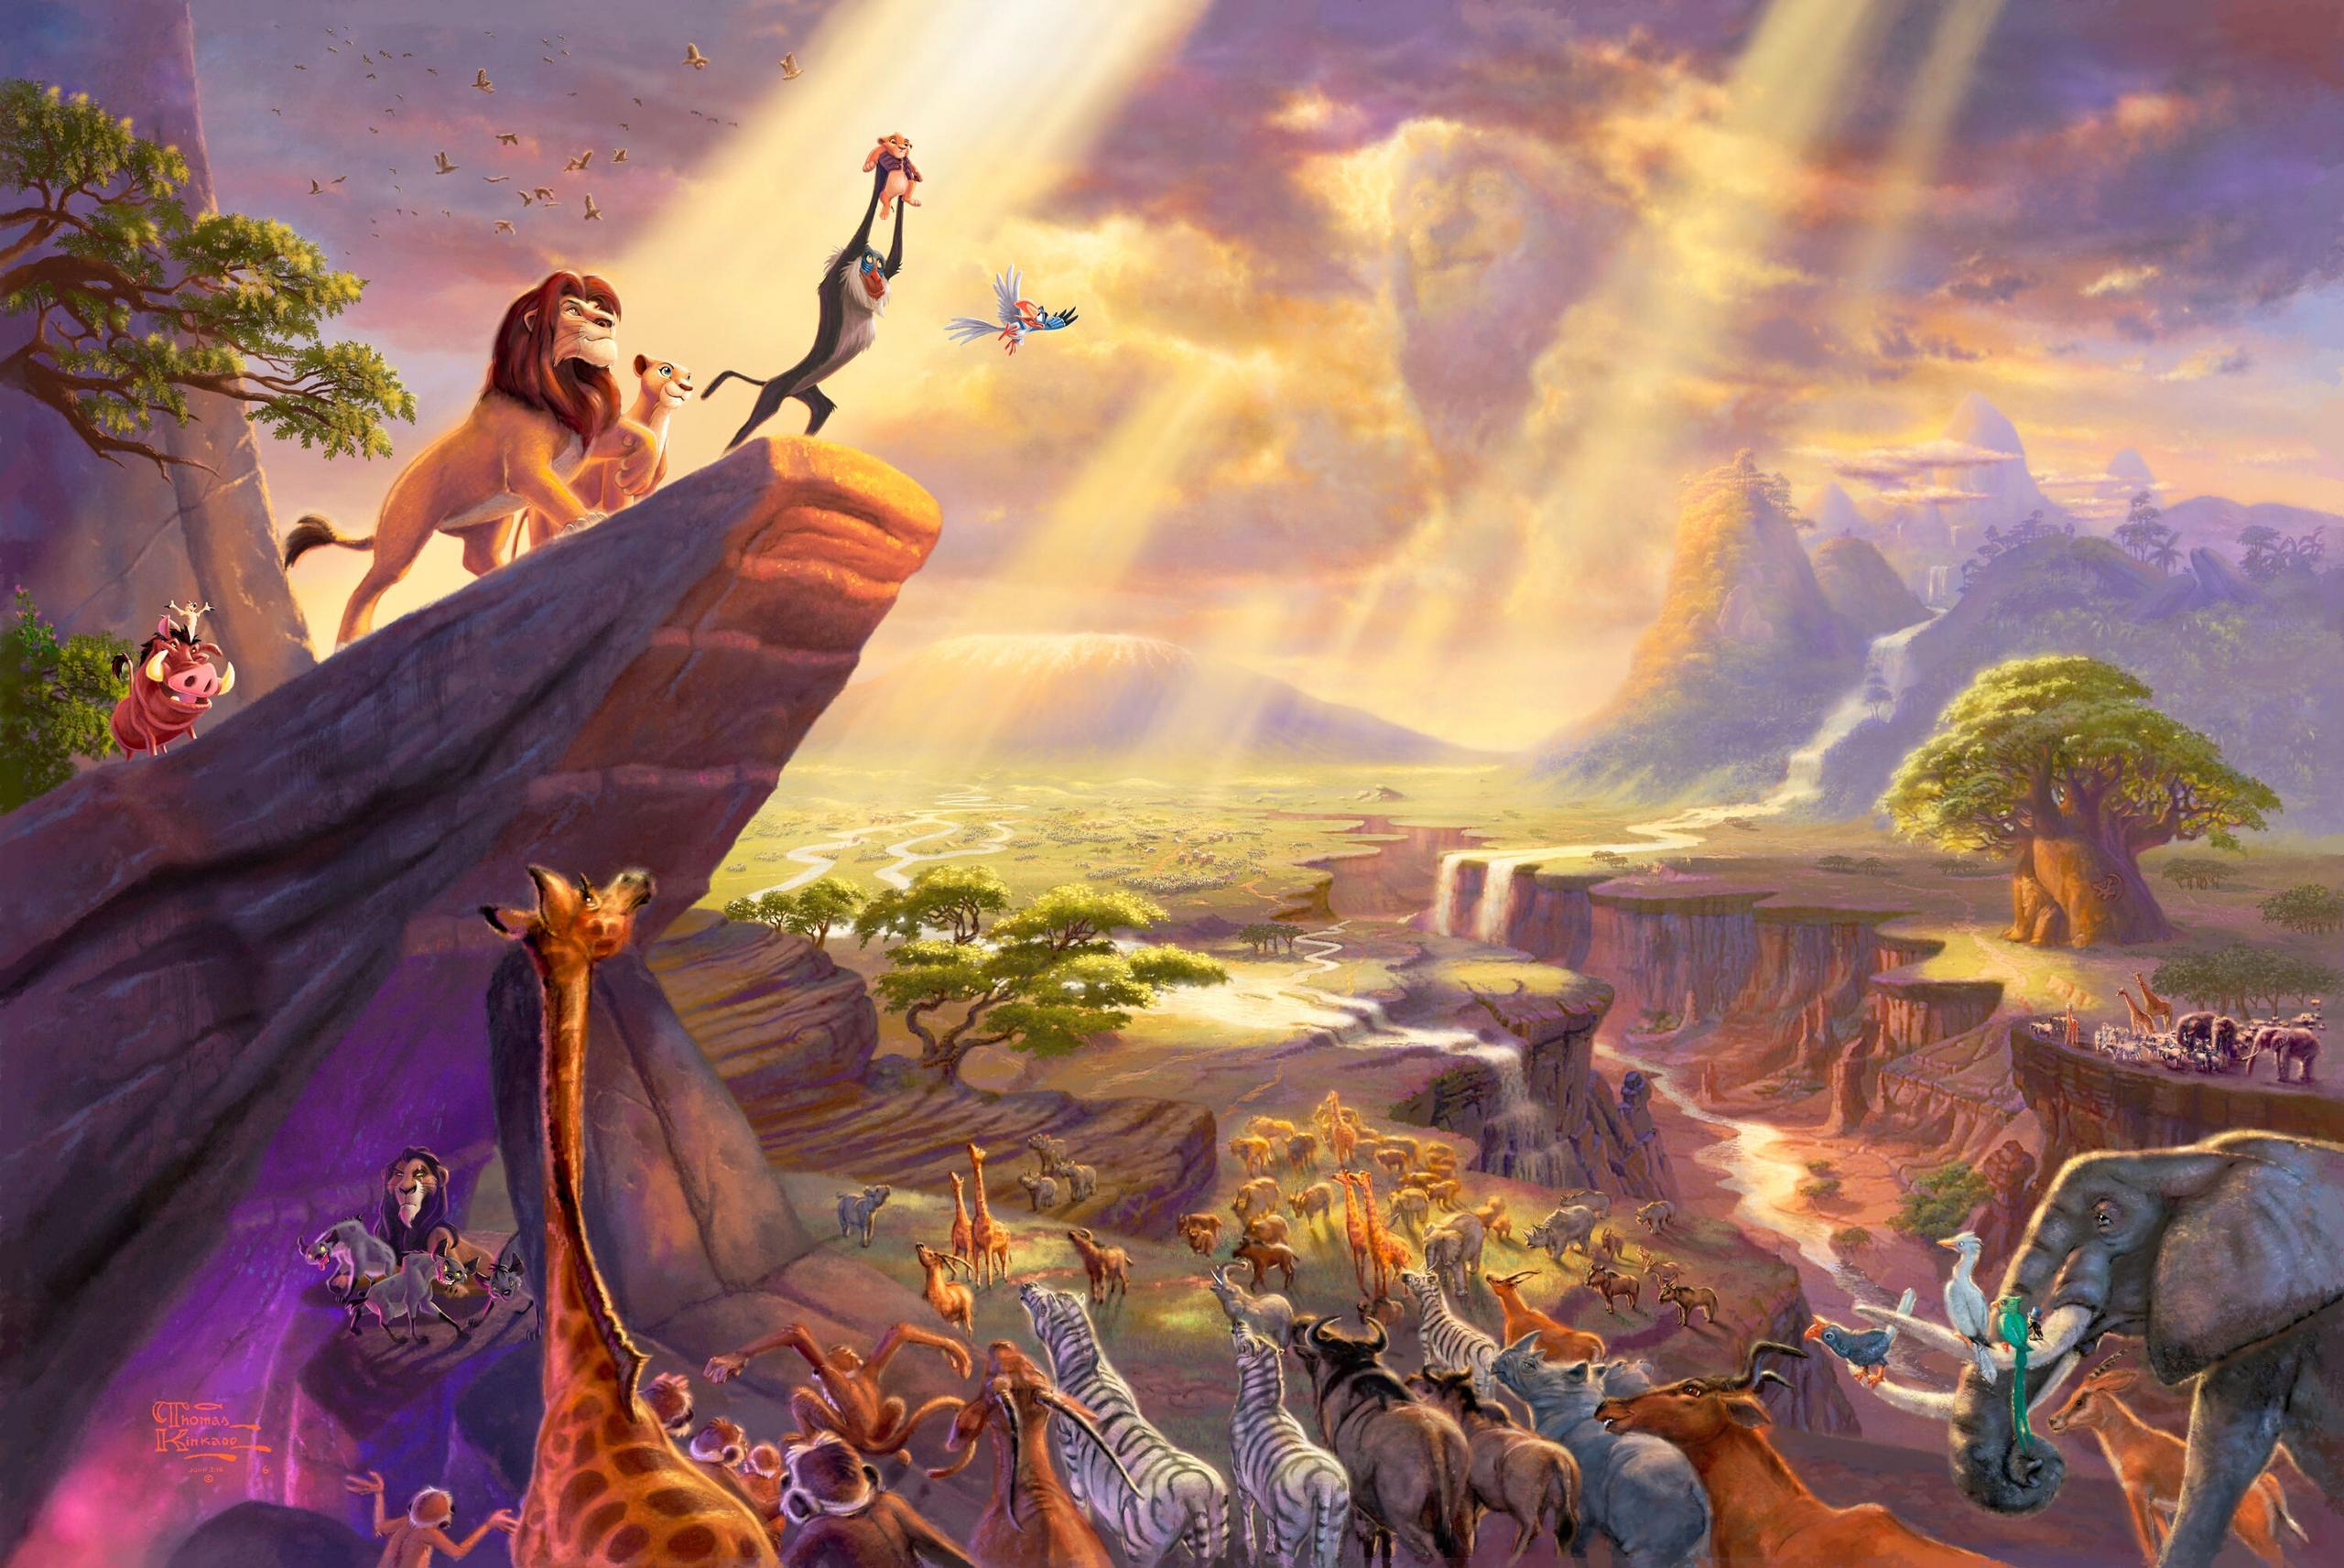 ajilbabcomthethe lion king wallpaper disney wallpapers desktophtm 2560x1713